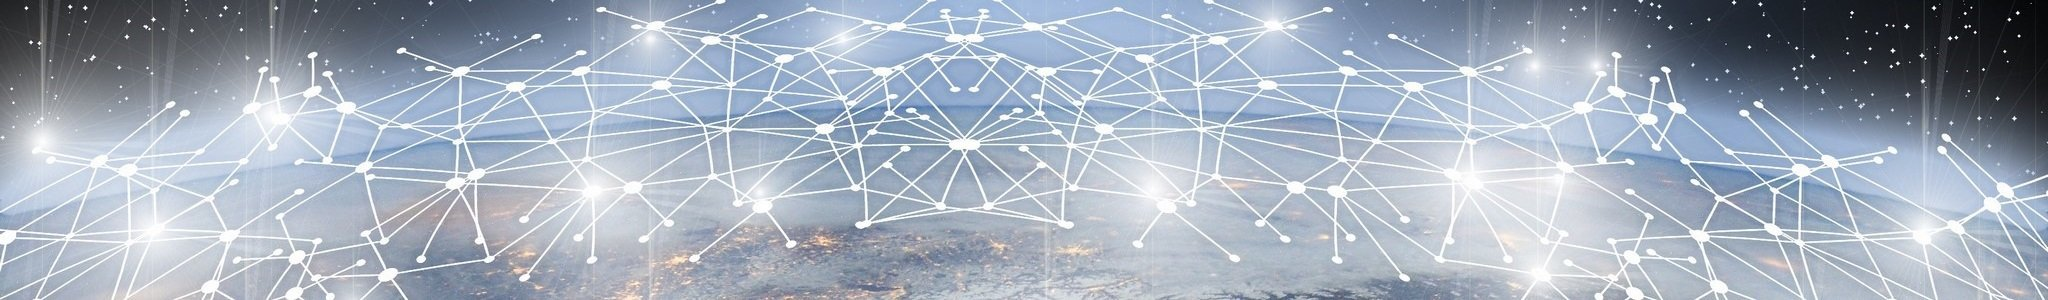 tecnologia redes